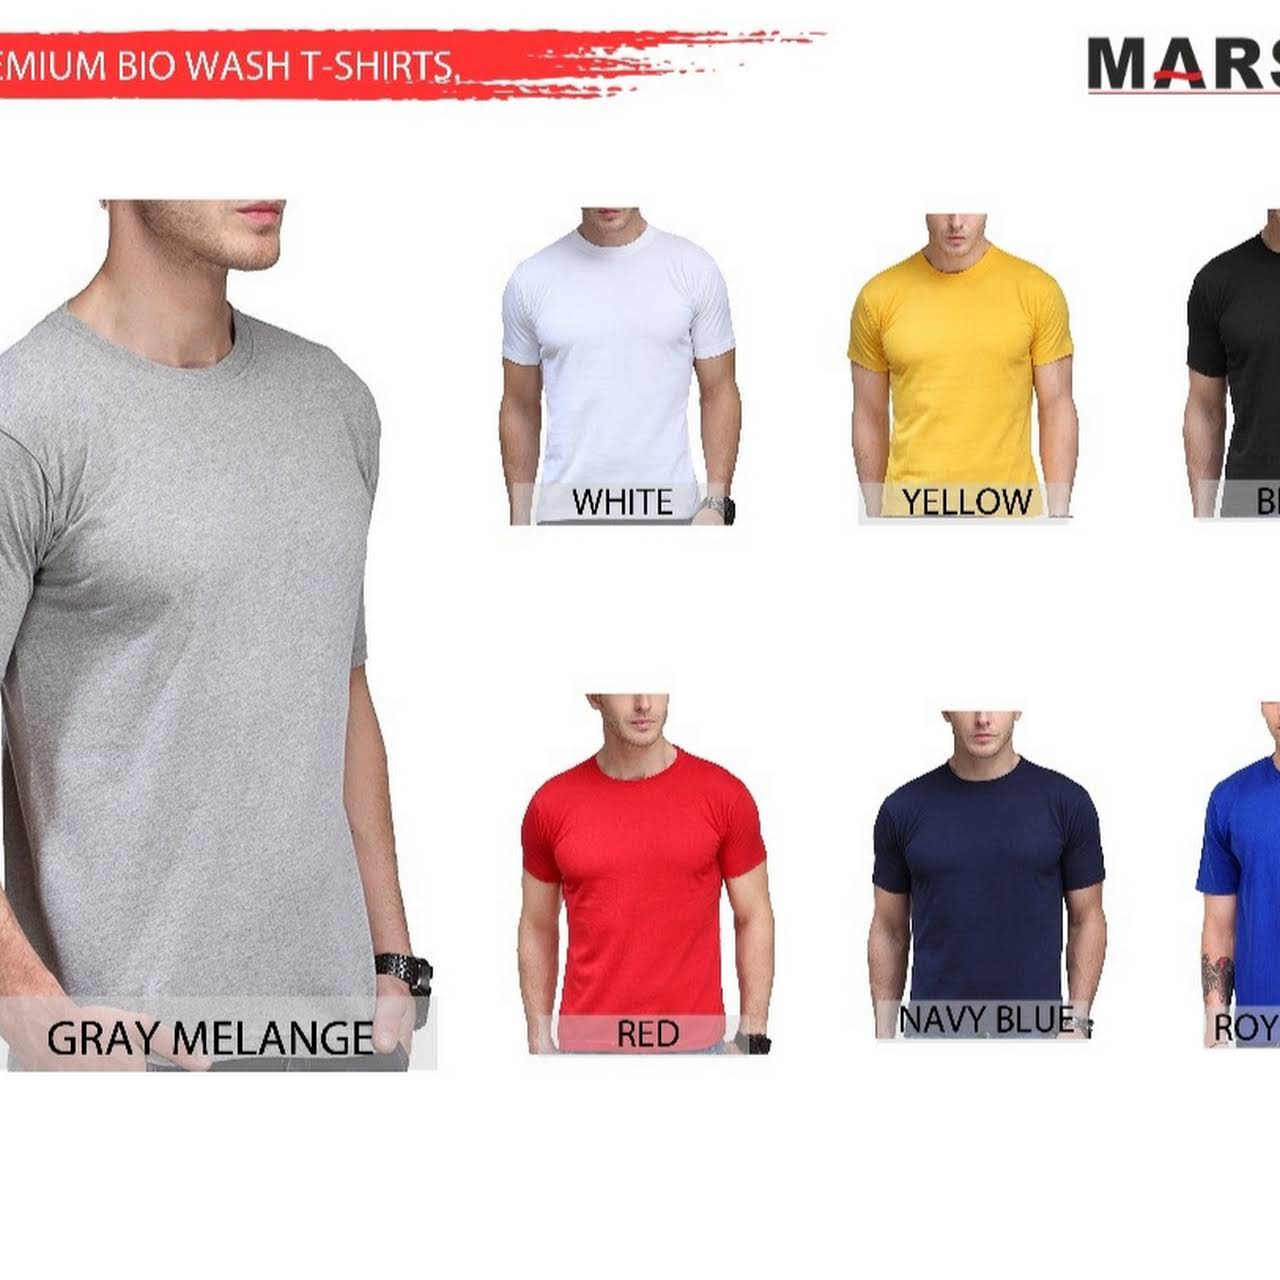 Wholesale T Shirt Printing In Bangalore